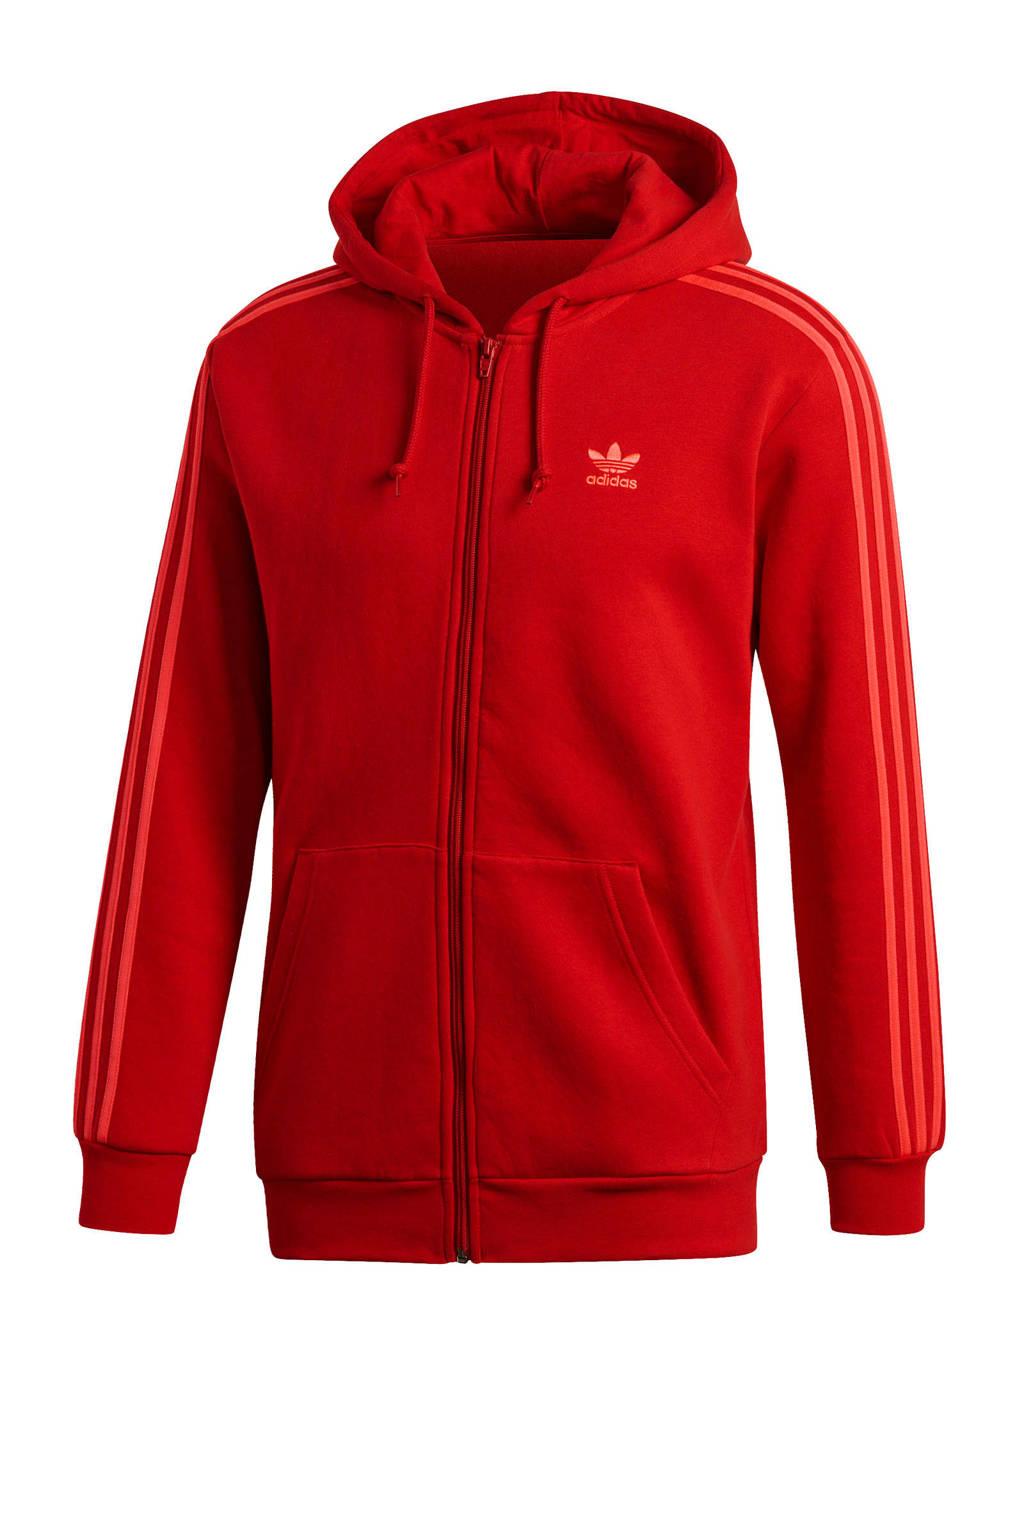 adidas Originals   Adicolor vest rood/roze, Rood/roze